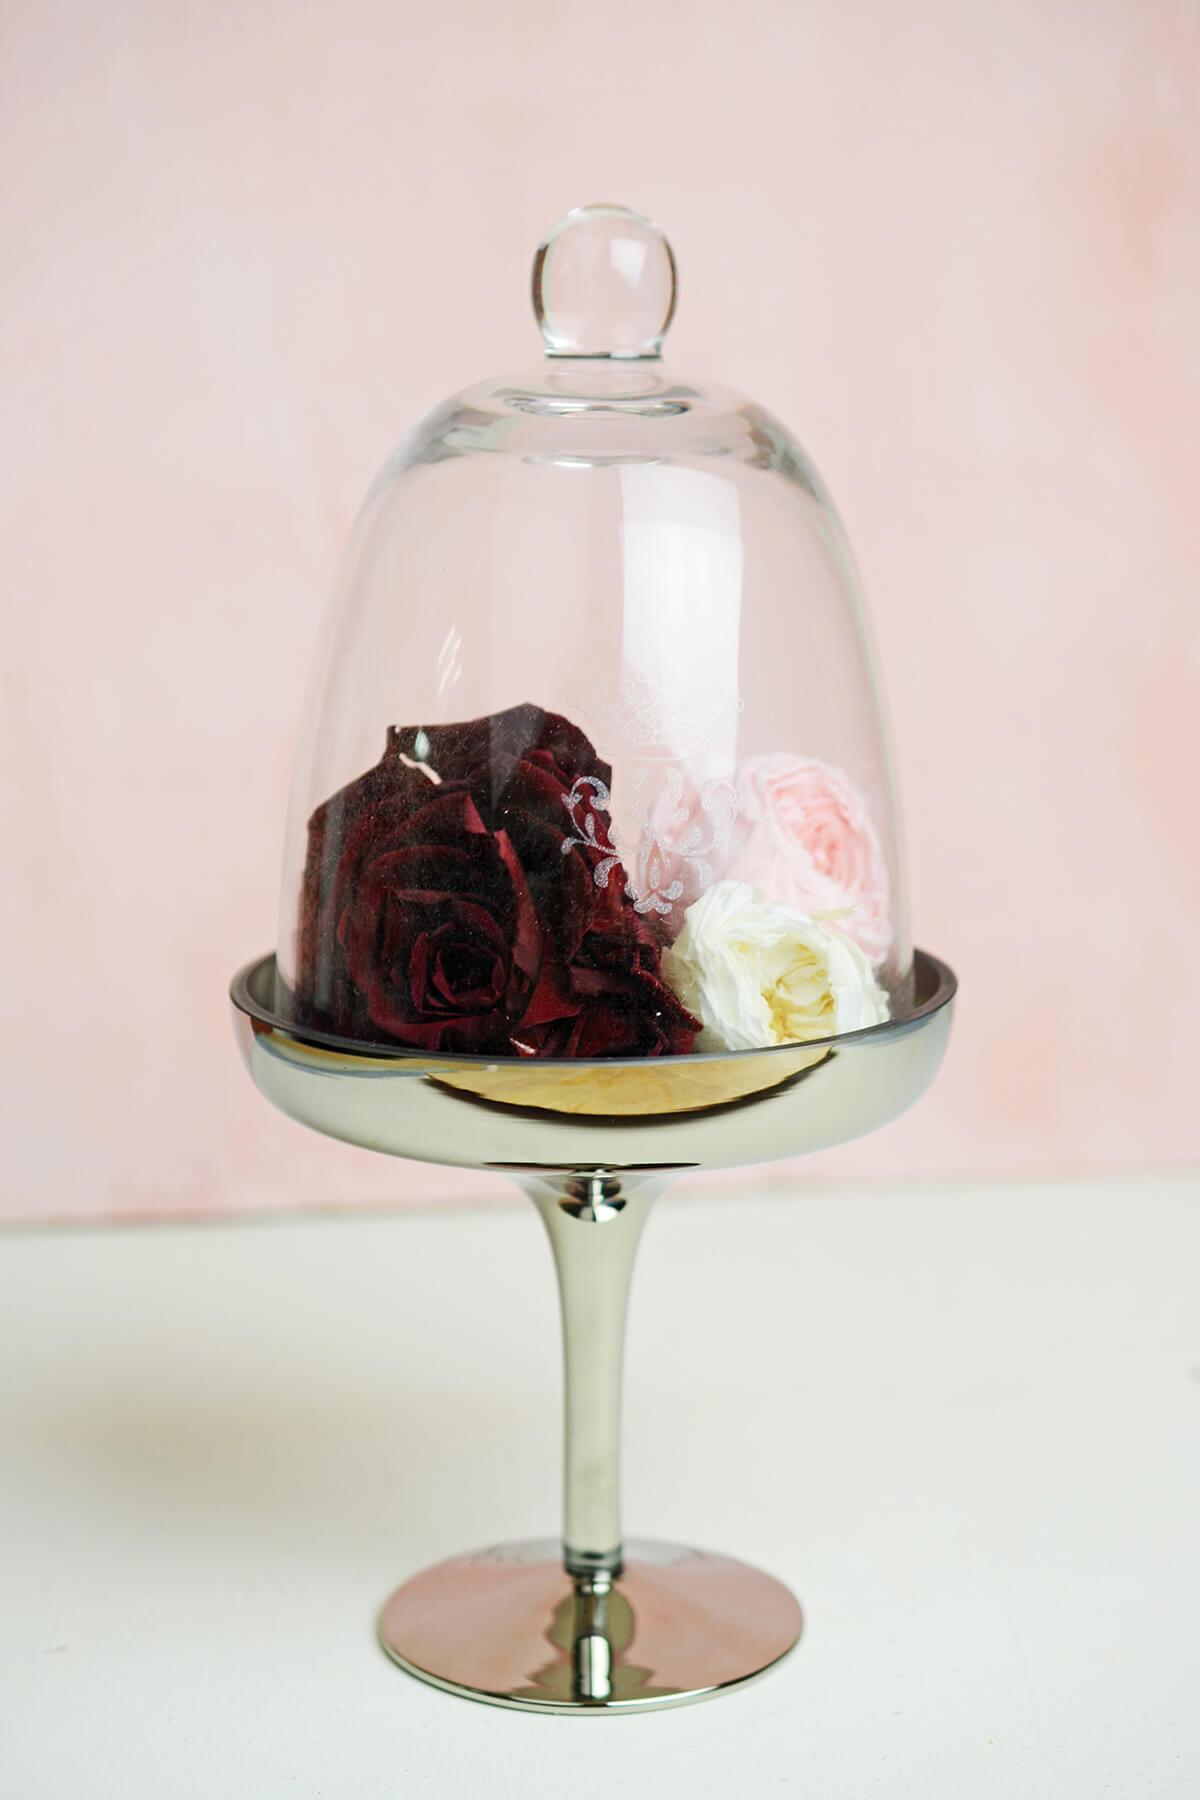 Glass & Silver Pedestal 10in Dessert Stand Cloche